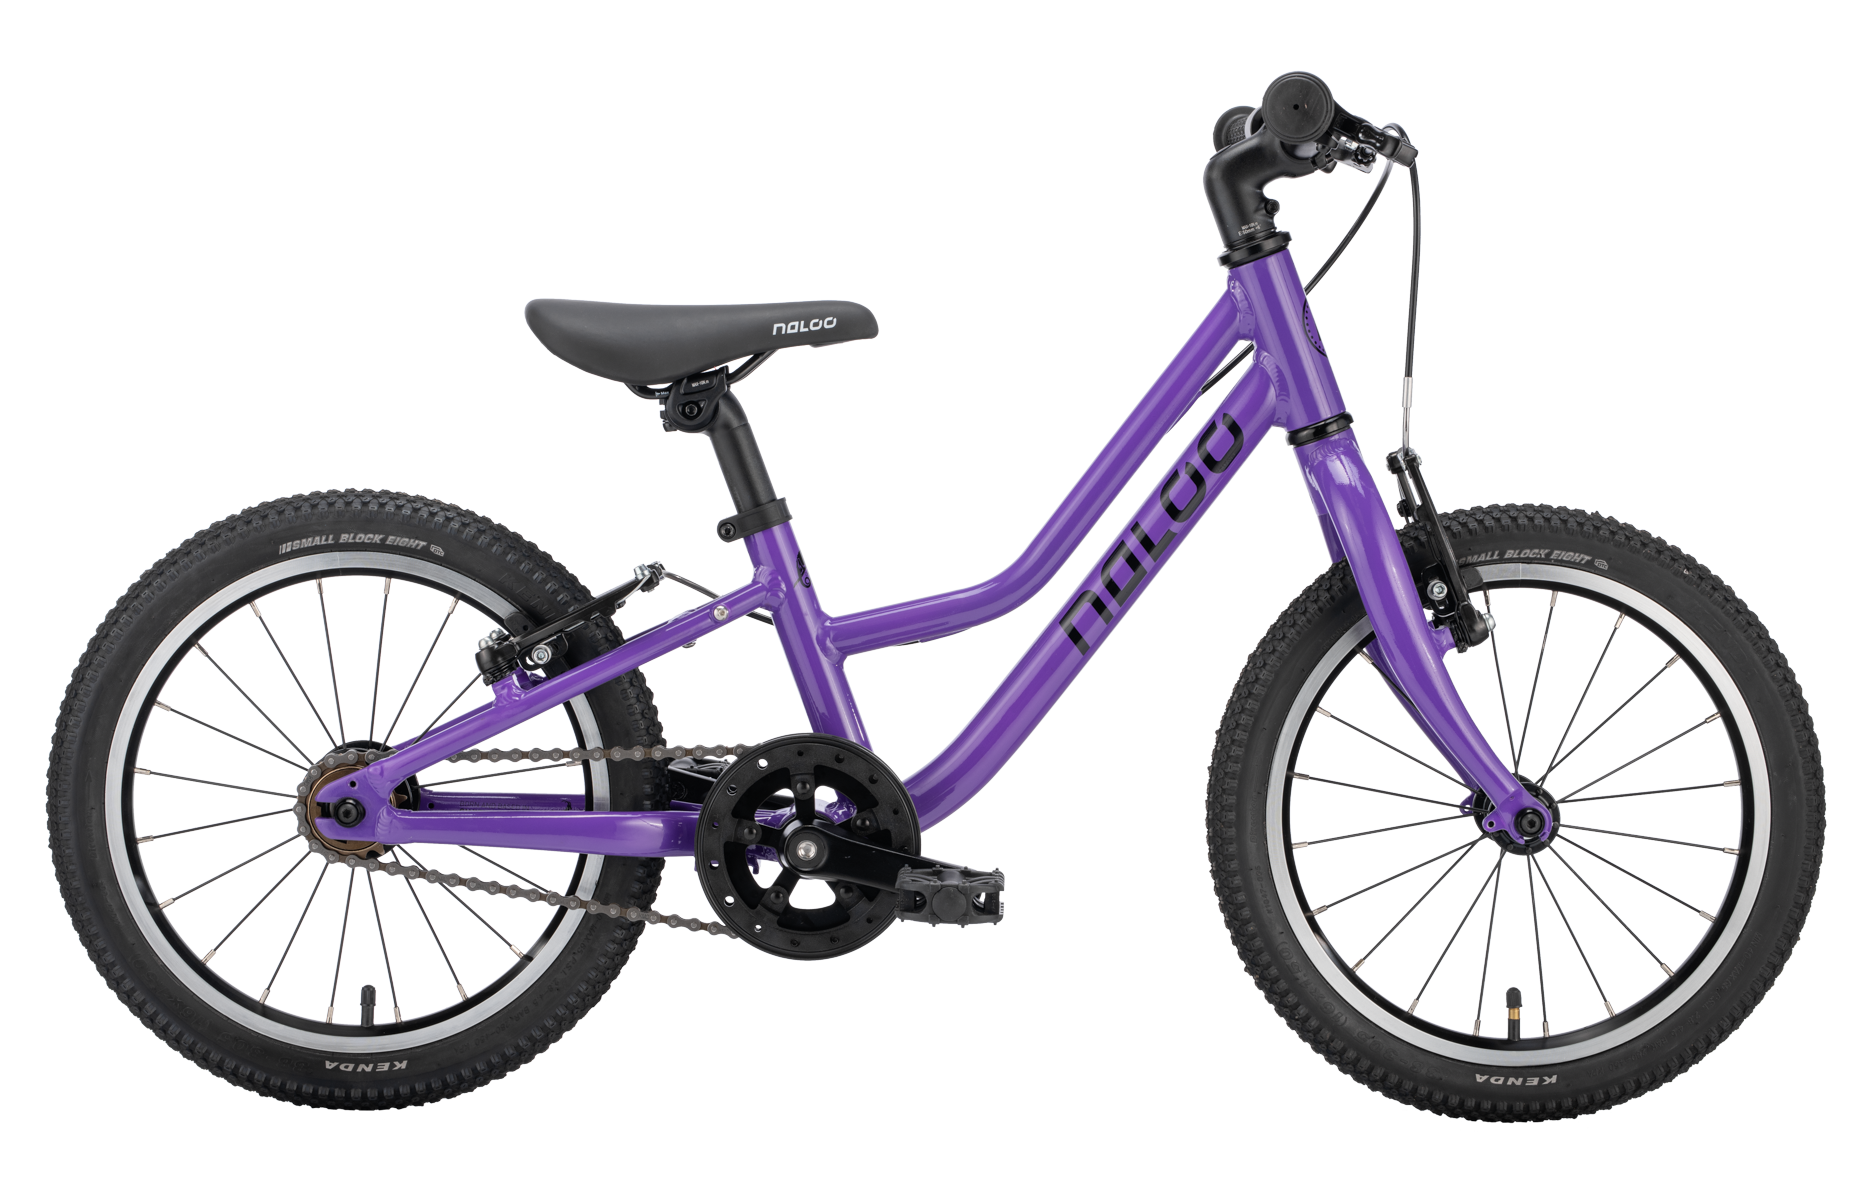 naloo_chameleon_mk2_16_purple.png